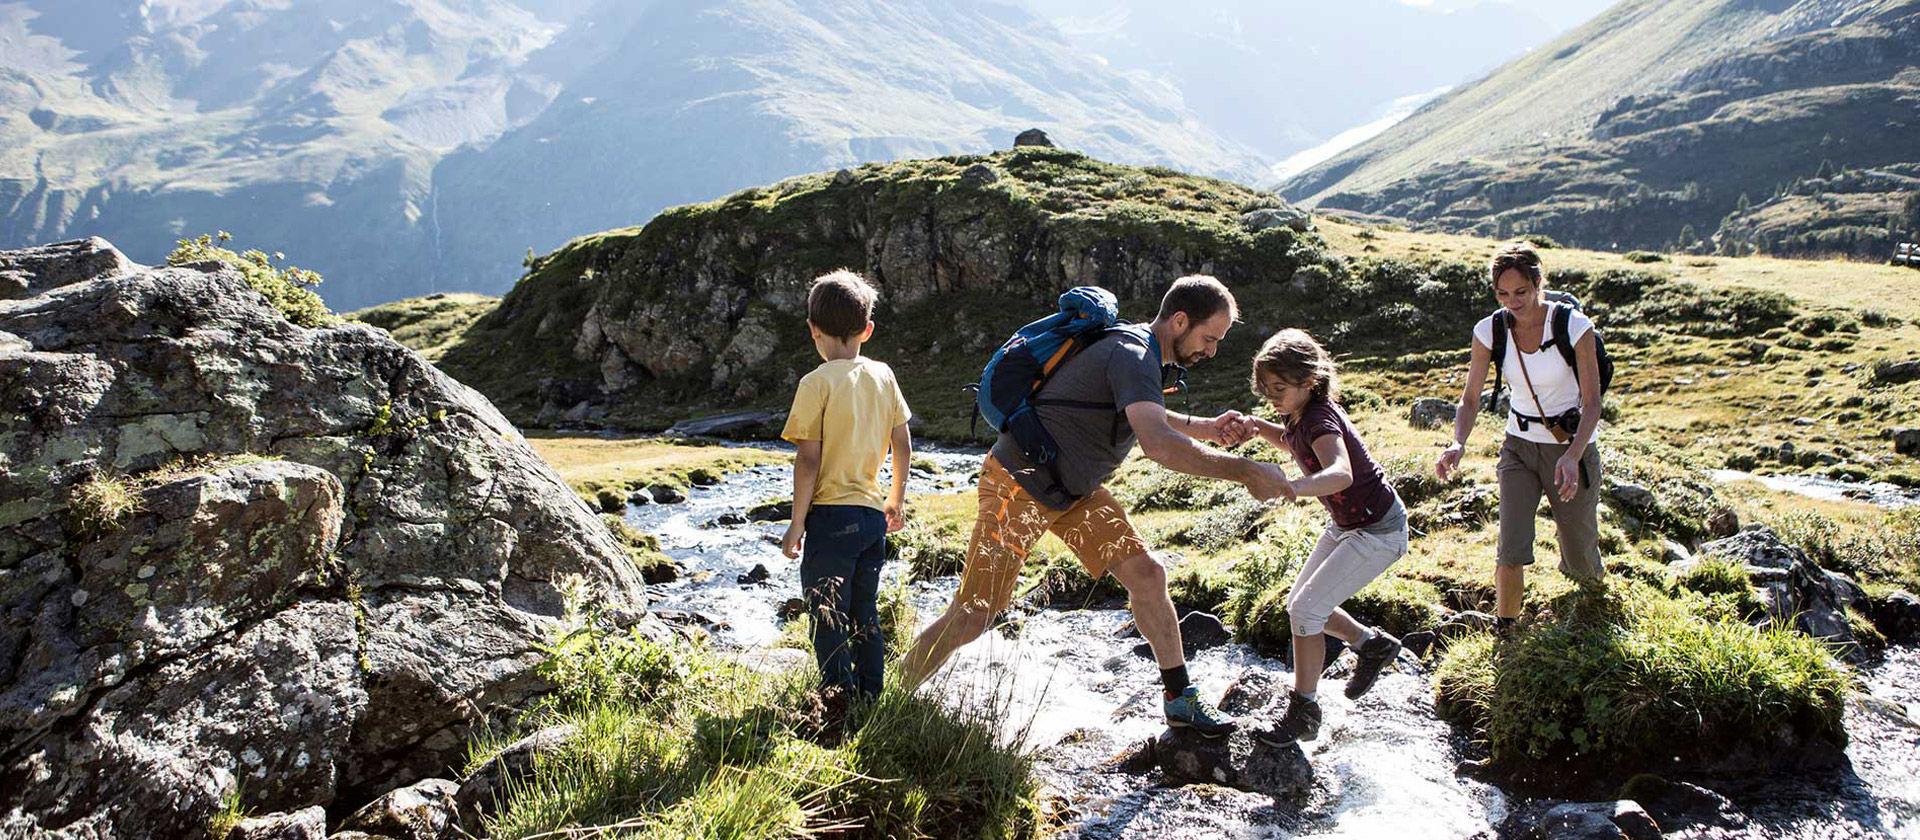 Wandern im Naturpark - Foto: Kaunertaler Gletscher, Daniel Zangerl